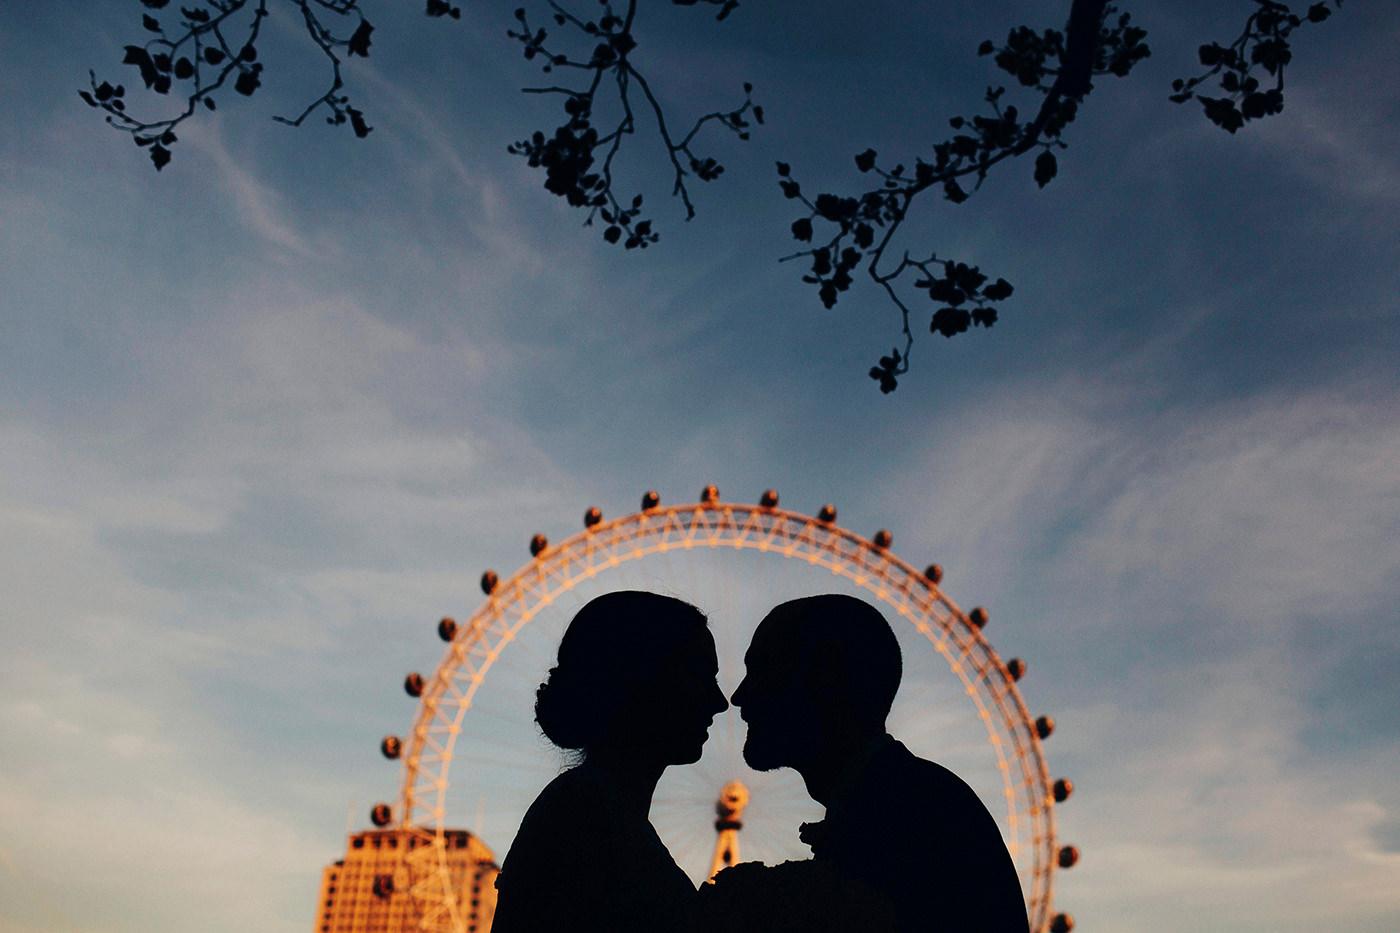 Silhouette wedding photo with ferris wheel